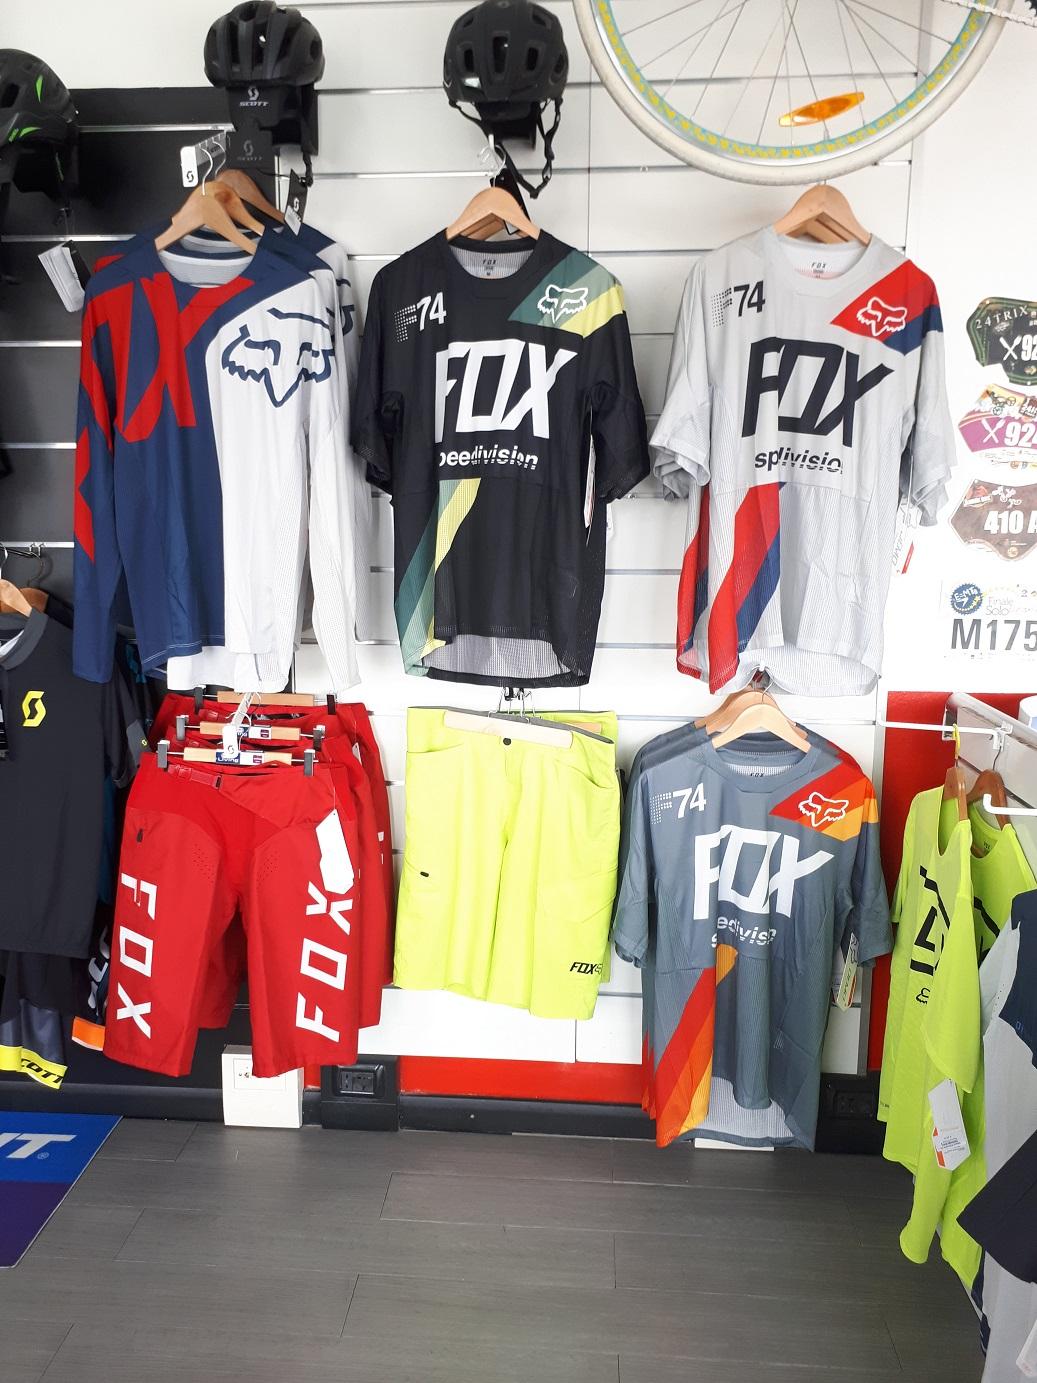 Abbigliamento Fox Racing Mtb Dh Enduro Trail 2018-Ranger Attack Pro Flexair Demo- Dottorbike.it Rozzano